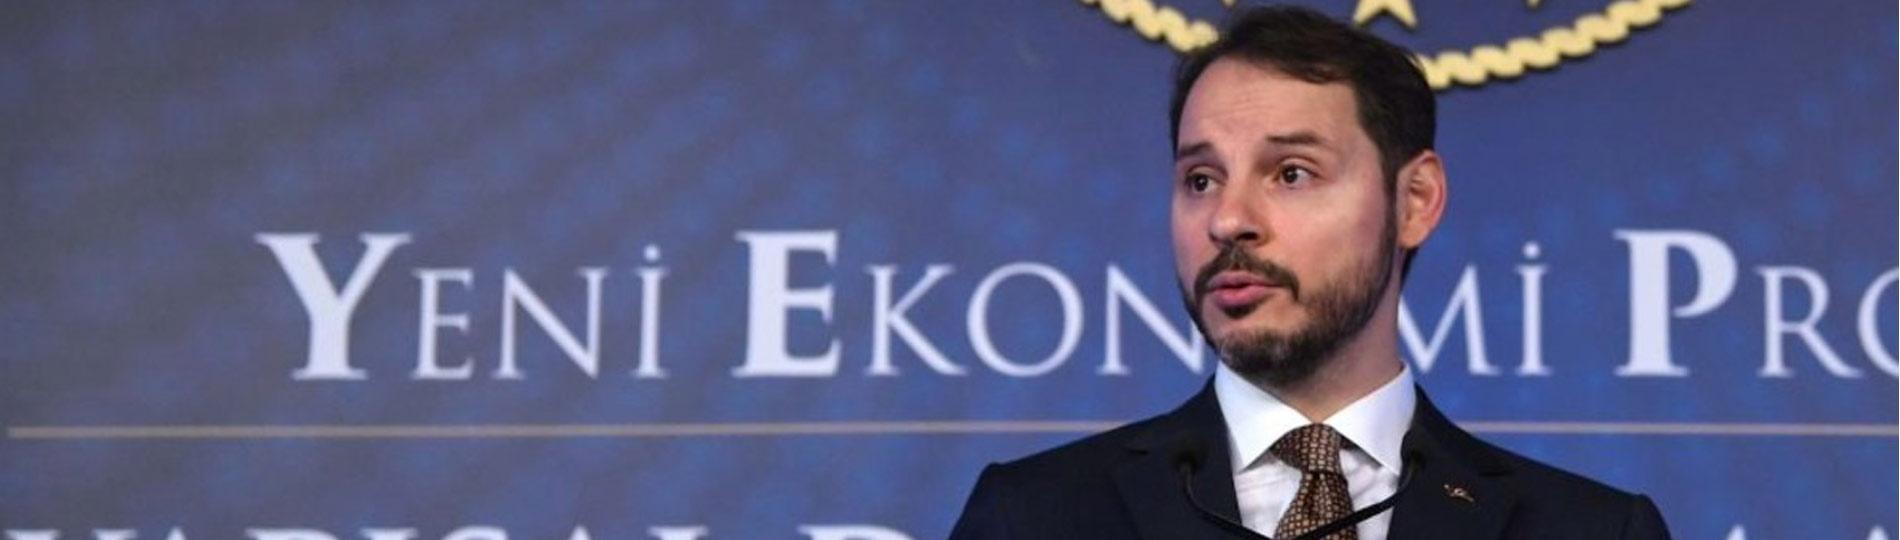 Turkey's new reform agenda takes on finance, inflation, tax regime